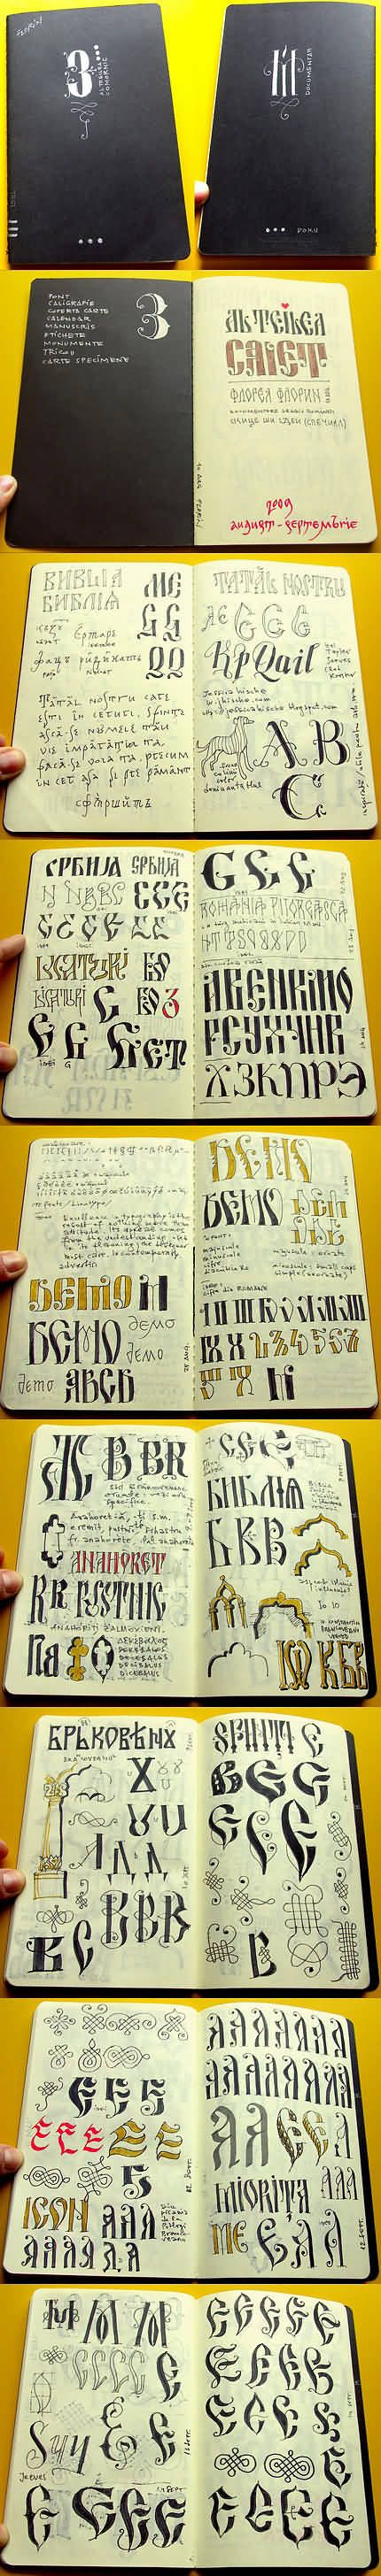 Sketchbook 3 - Archaic Romanian - Florin Florea. http://florinf.wordpress.com/2010/01/19/arhaic-romanesc-%E2%80%93-caiet-de-schite-3/#